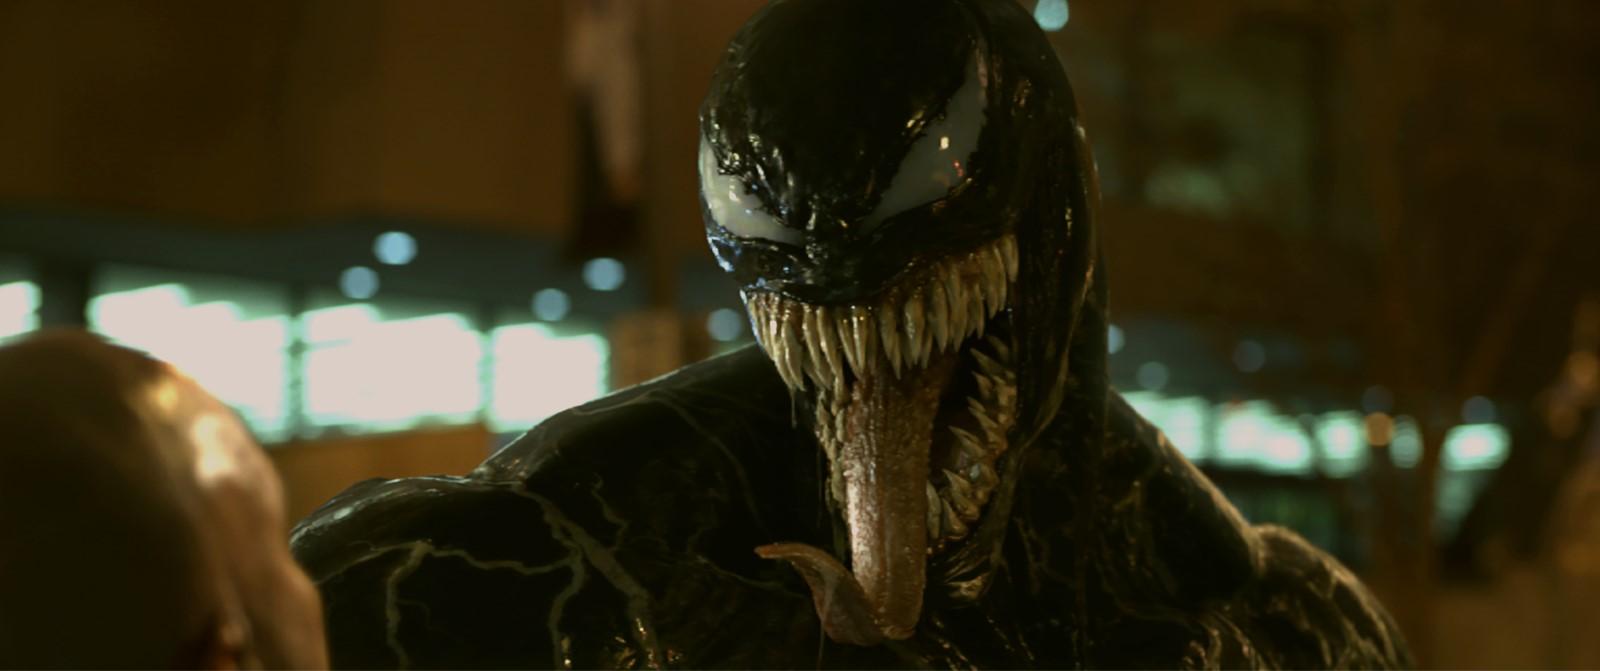 [Films] Venom 2520244